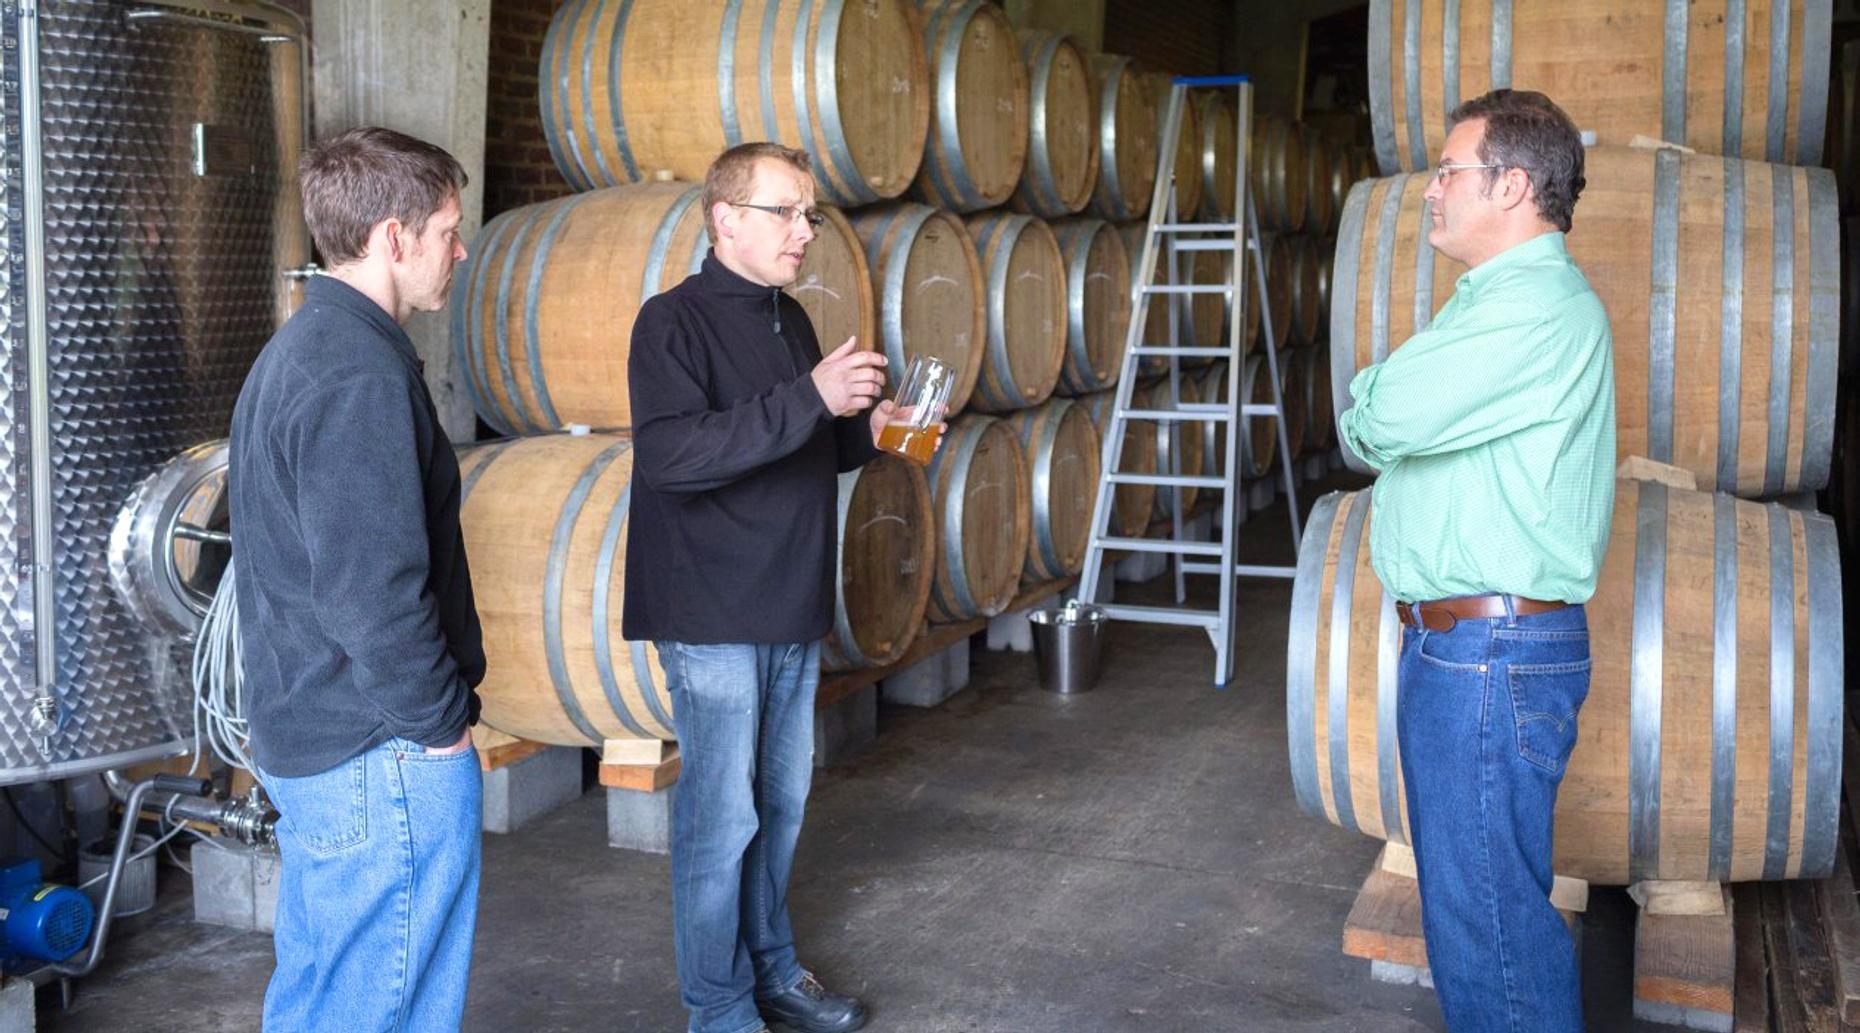 Master Brewer Tour in Lexington